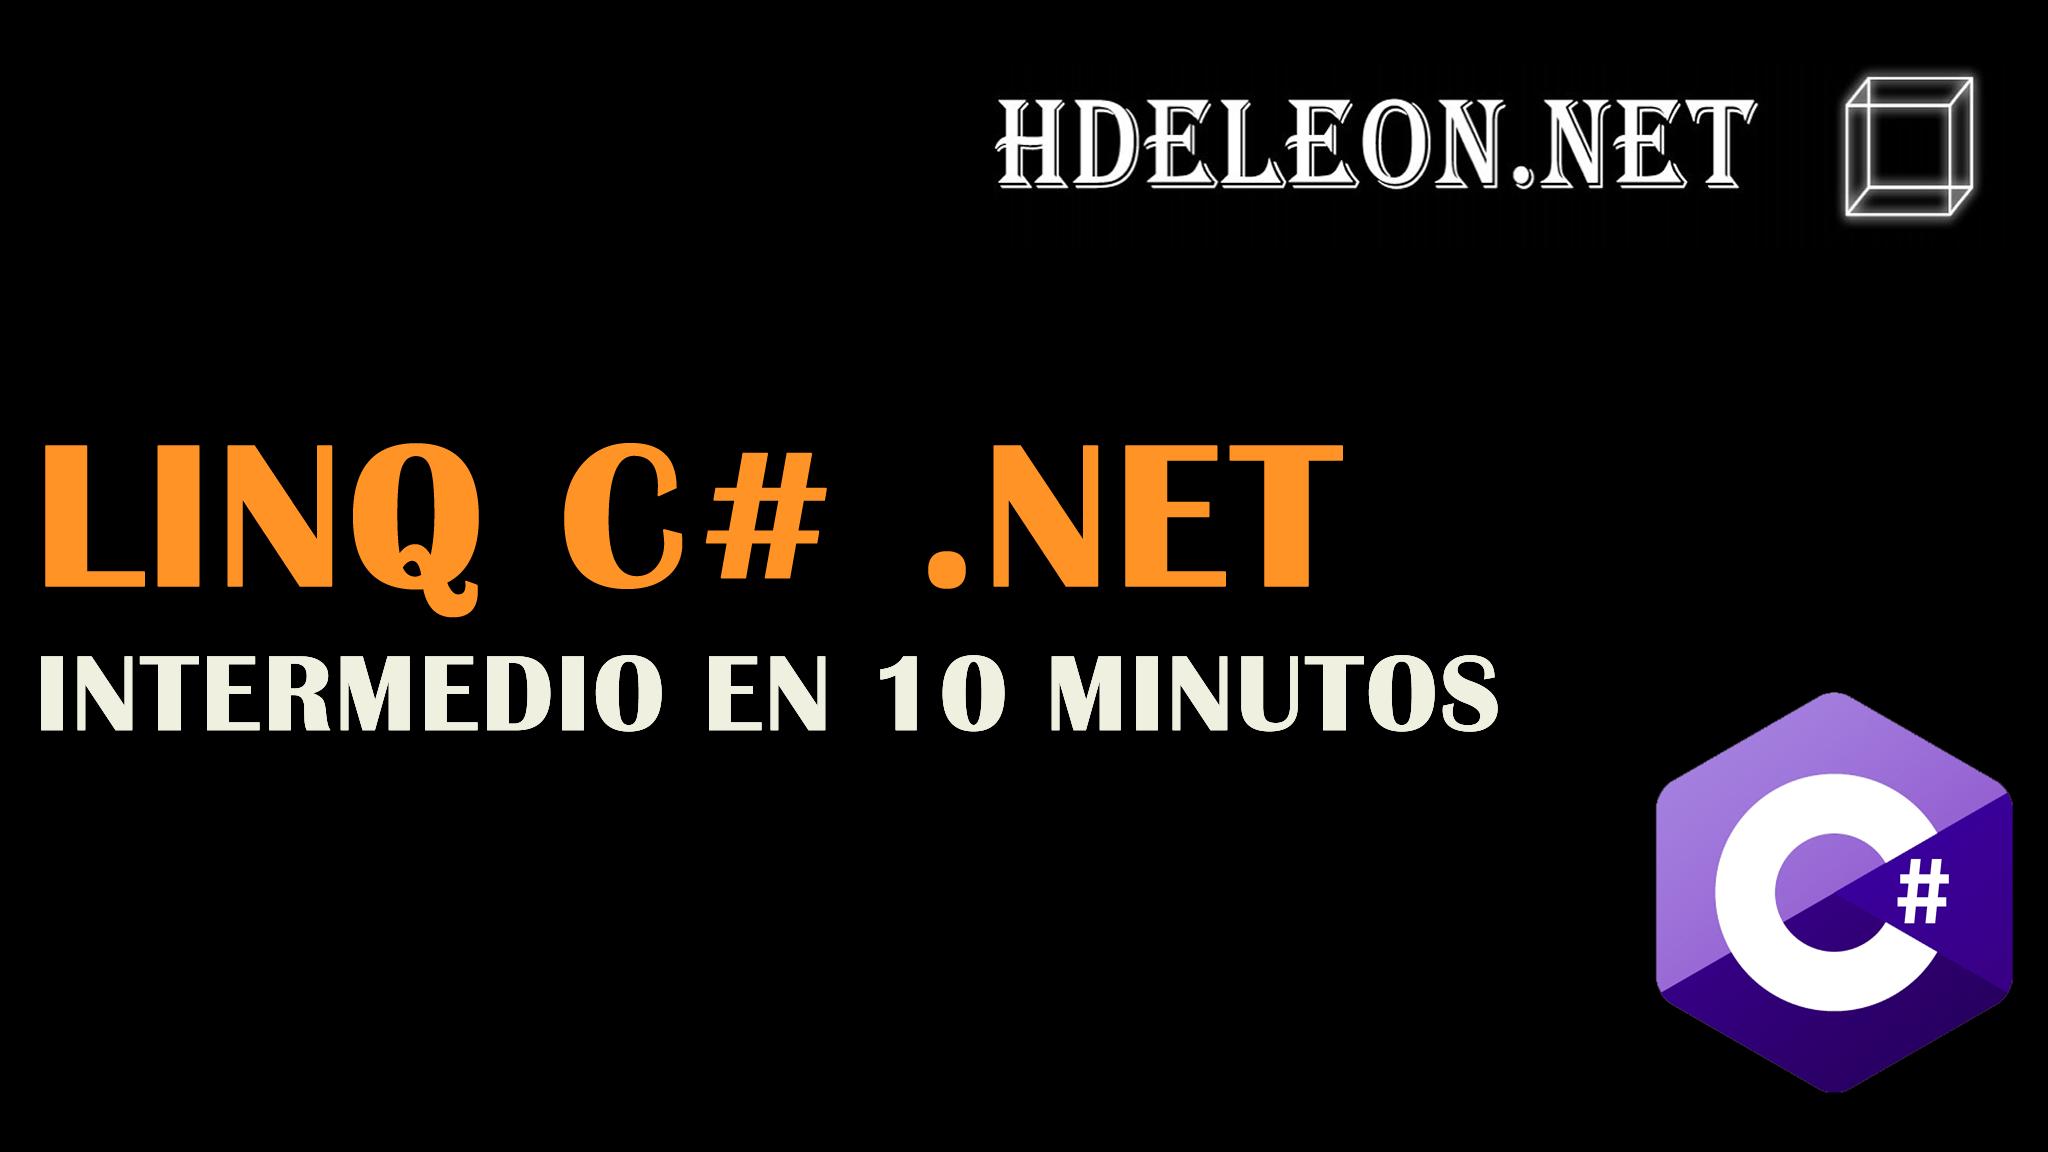 LINQ en C# .Net intermedio en 10 minutos, take, skip, select, union, count